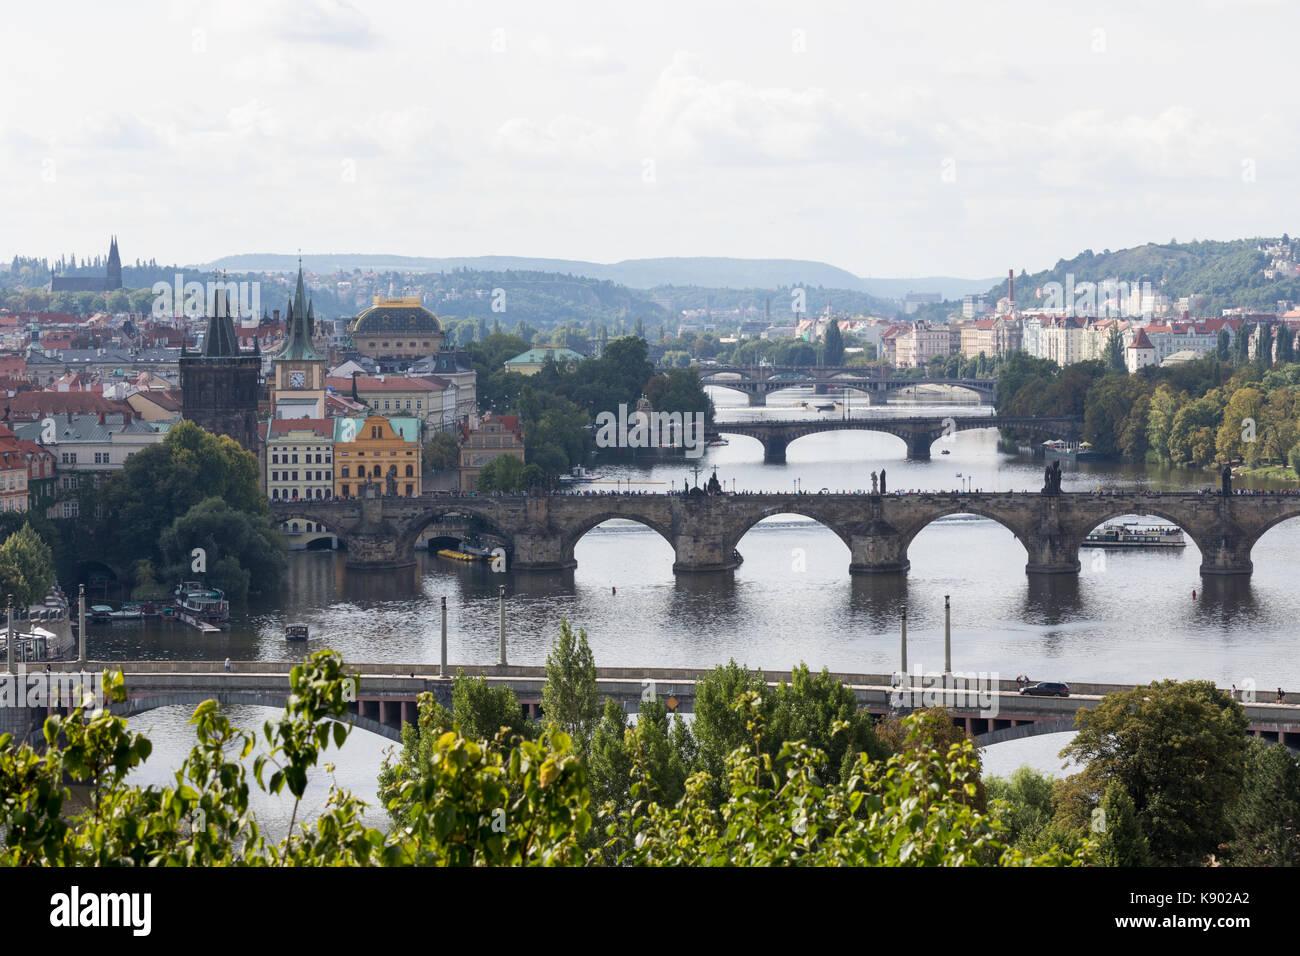 Prague, Czech Republic - August 21, 2017: View of the city's bridges from the top of Letna park - Stock Image